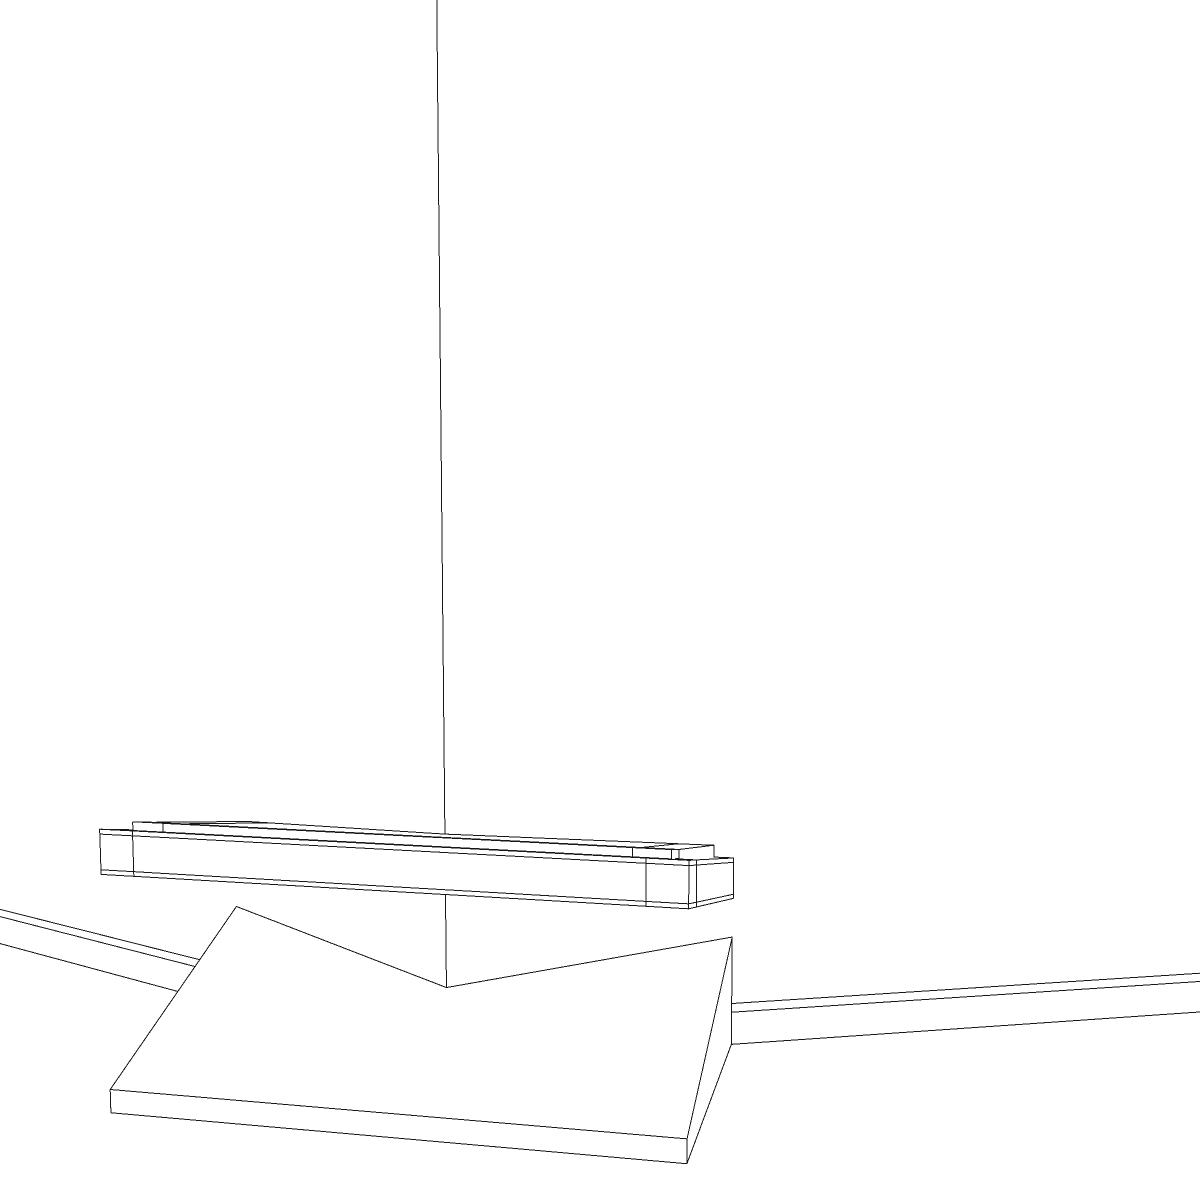 bathroom dumpster 3d model 3ds max fbx ma mb obj 155990